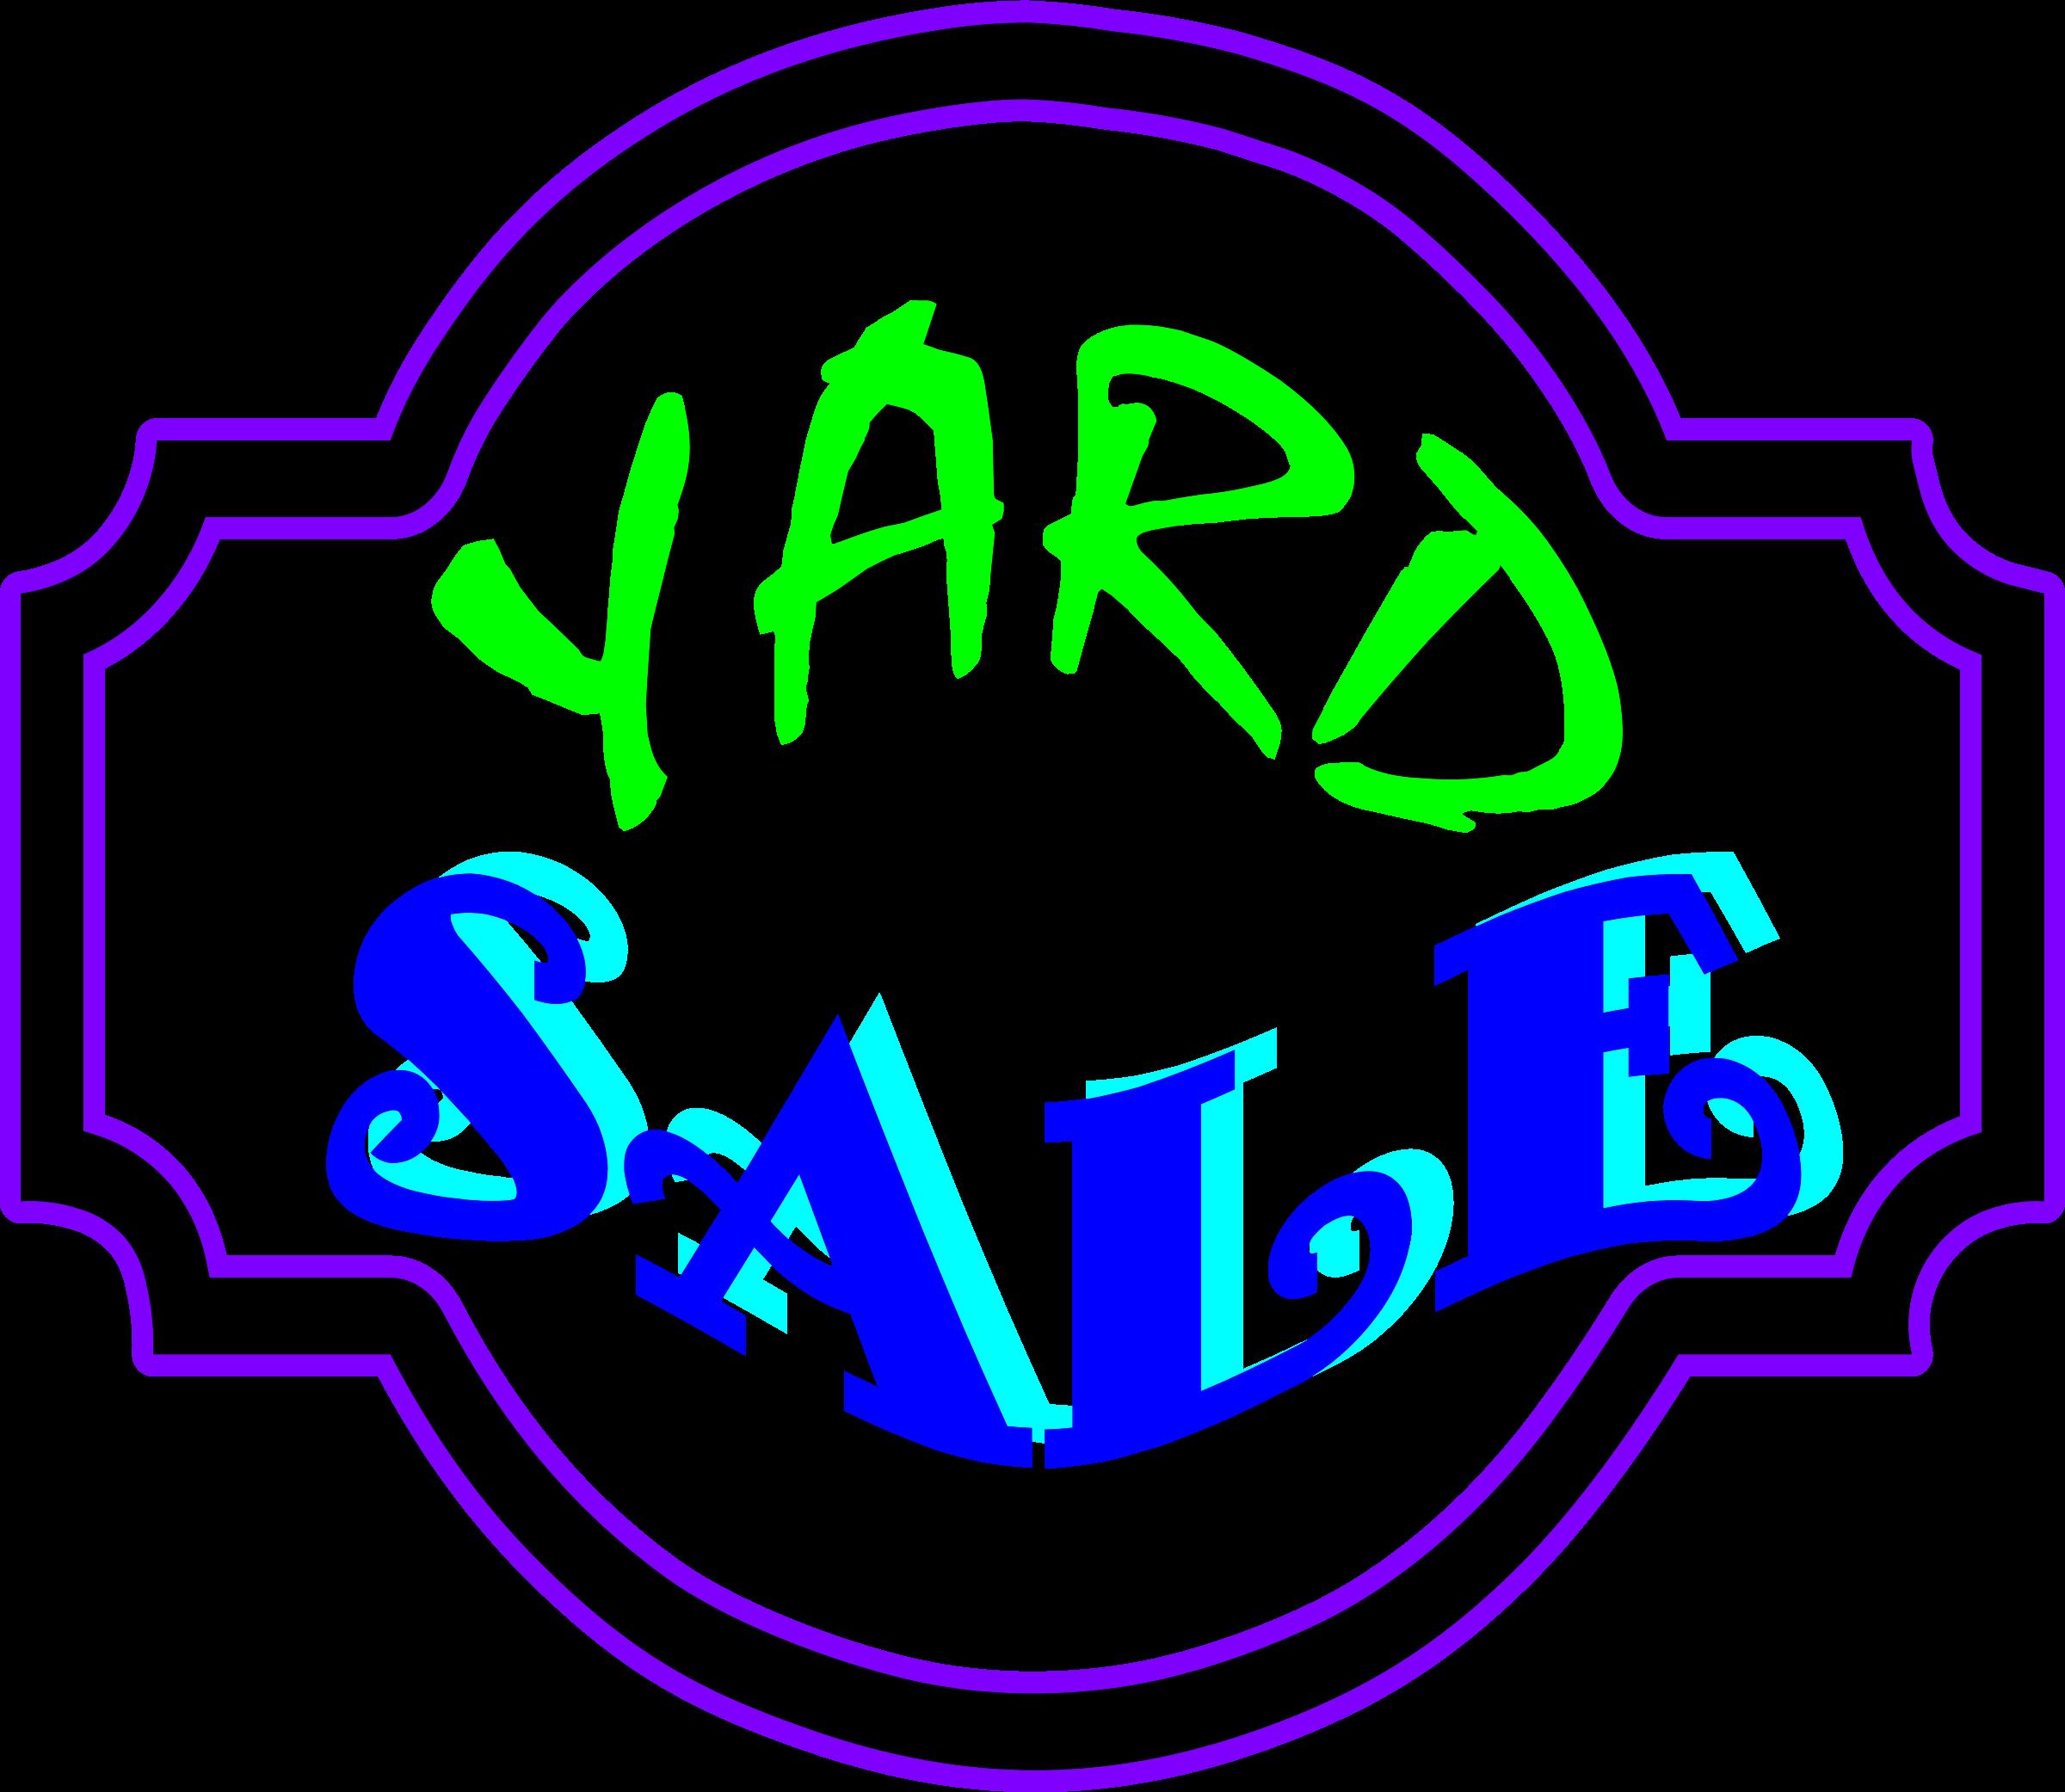 2400x2083 Free Png Yard Sale Sign Transparent Yard Sale Sign.png Images